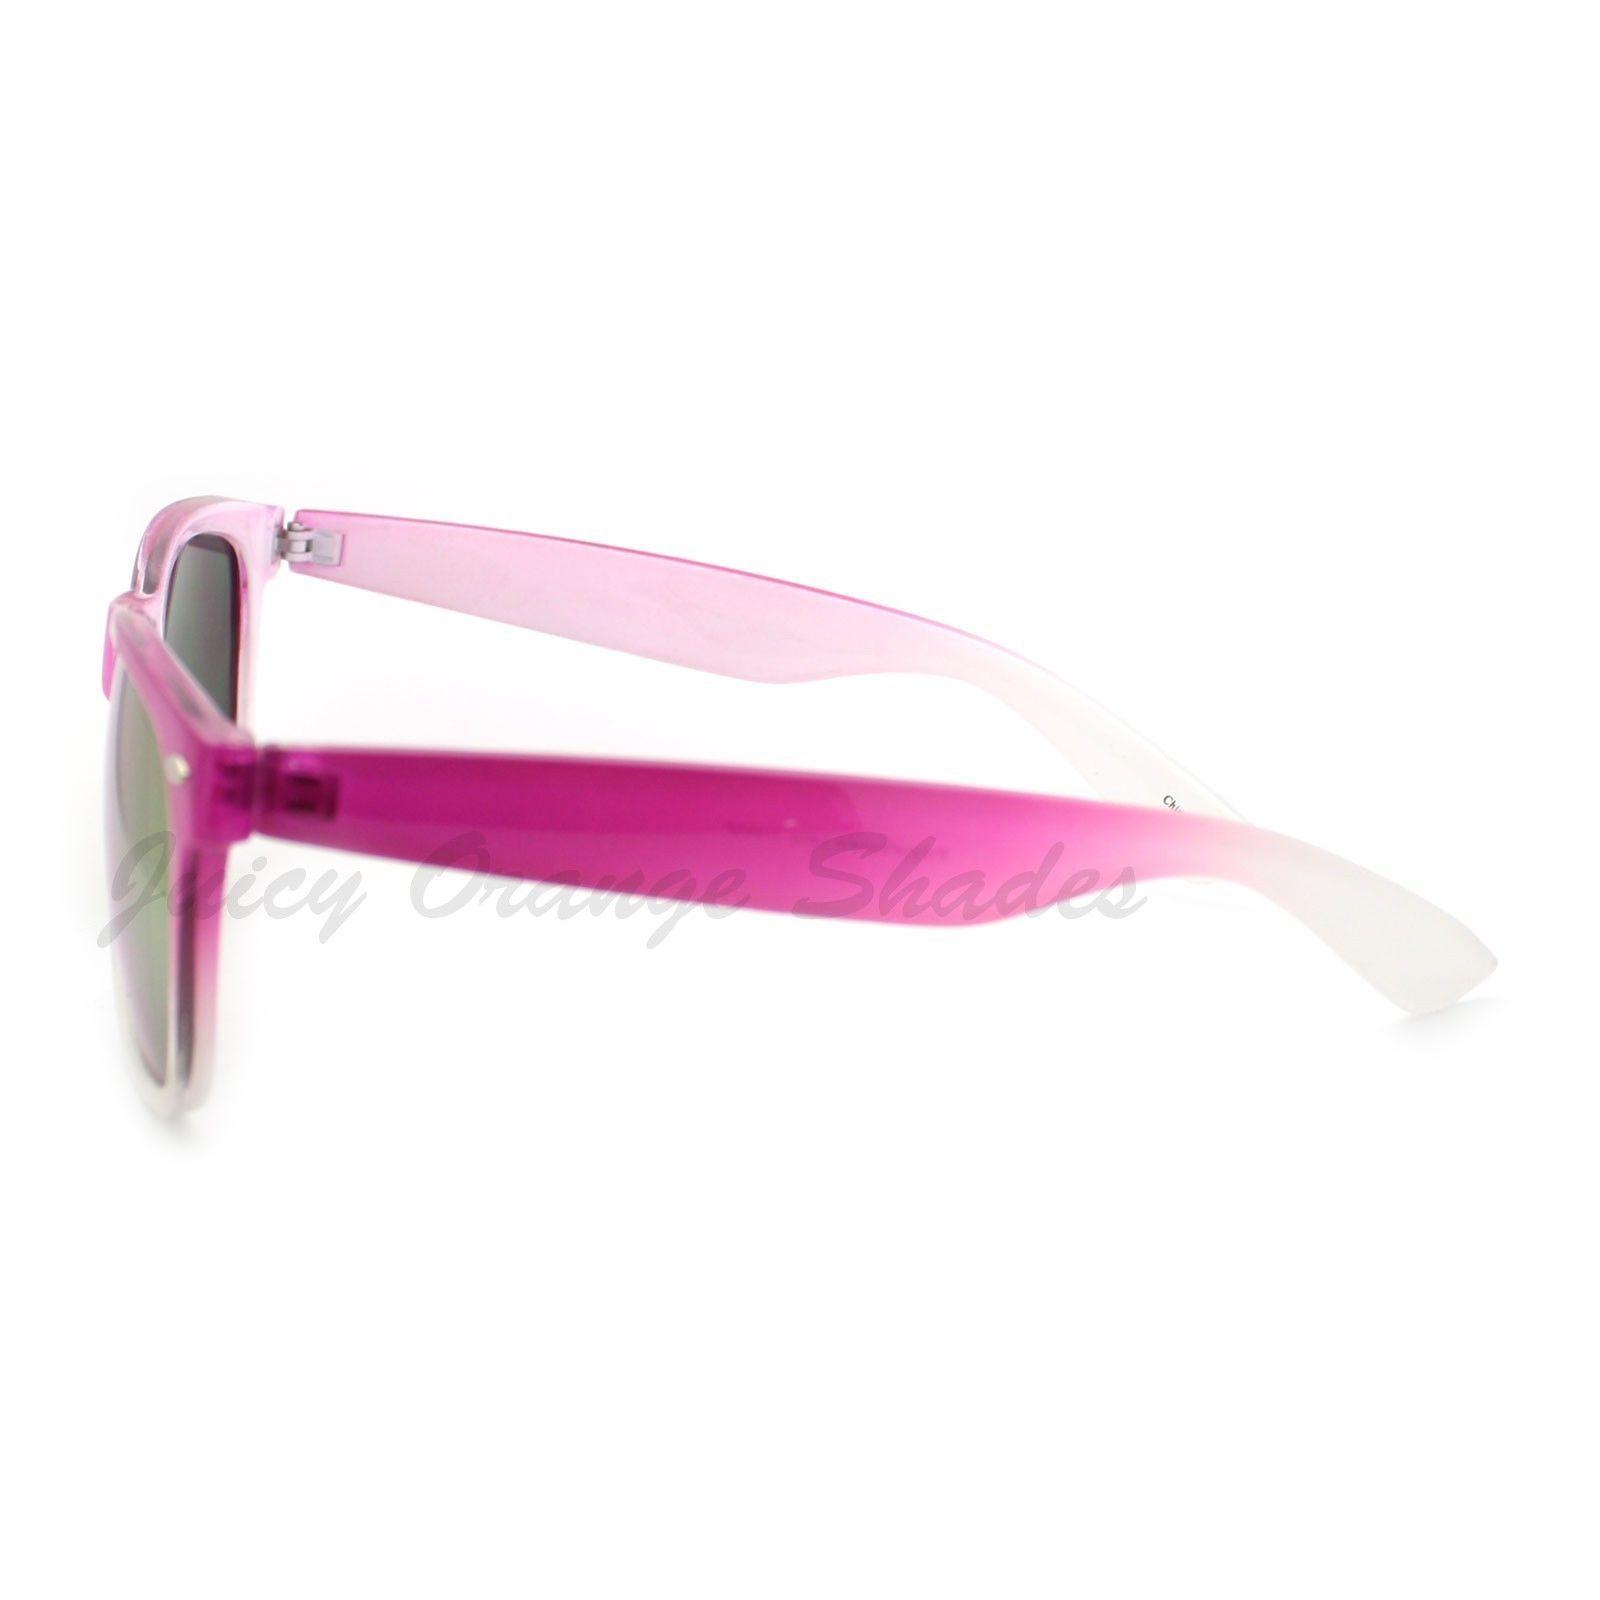 Classic 80's Horn Rim Sunglasses Color Fade Frames Mirror Lens